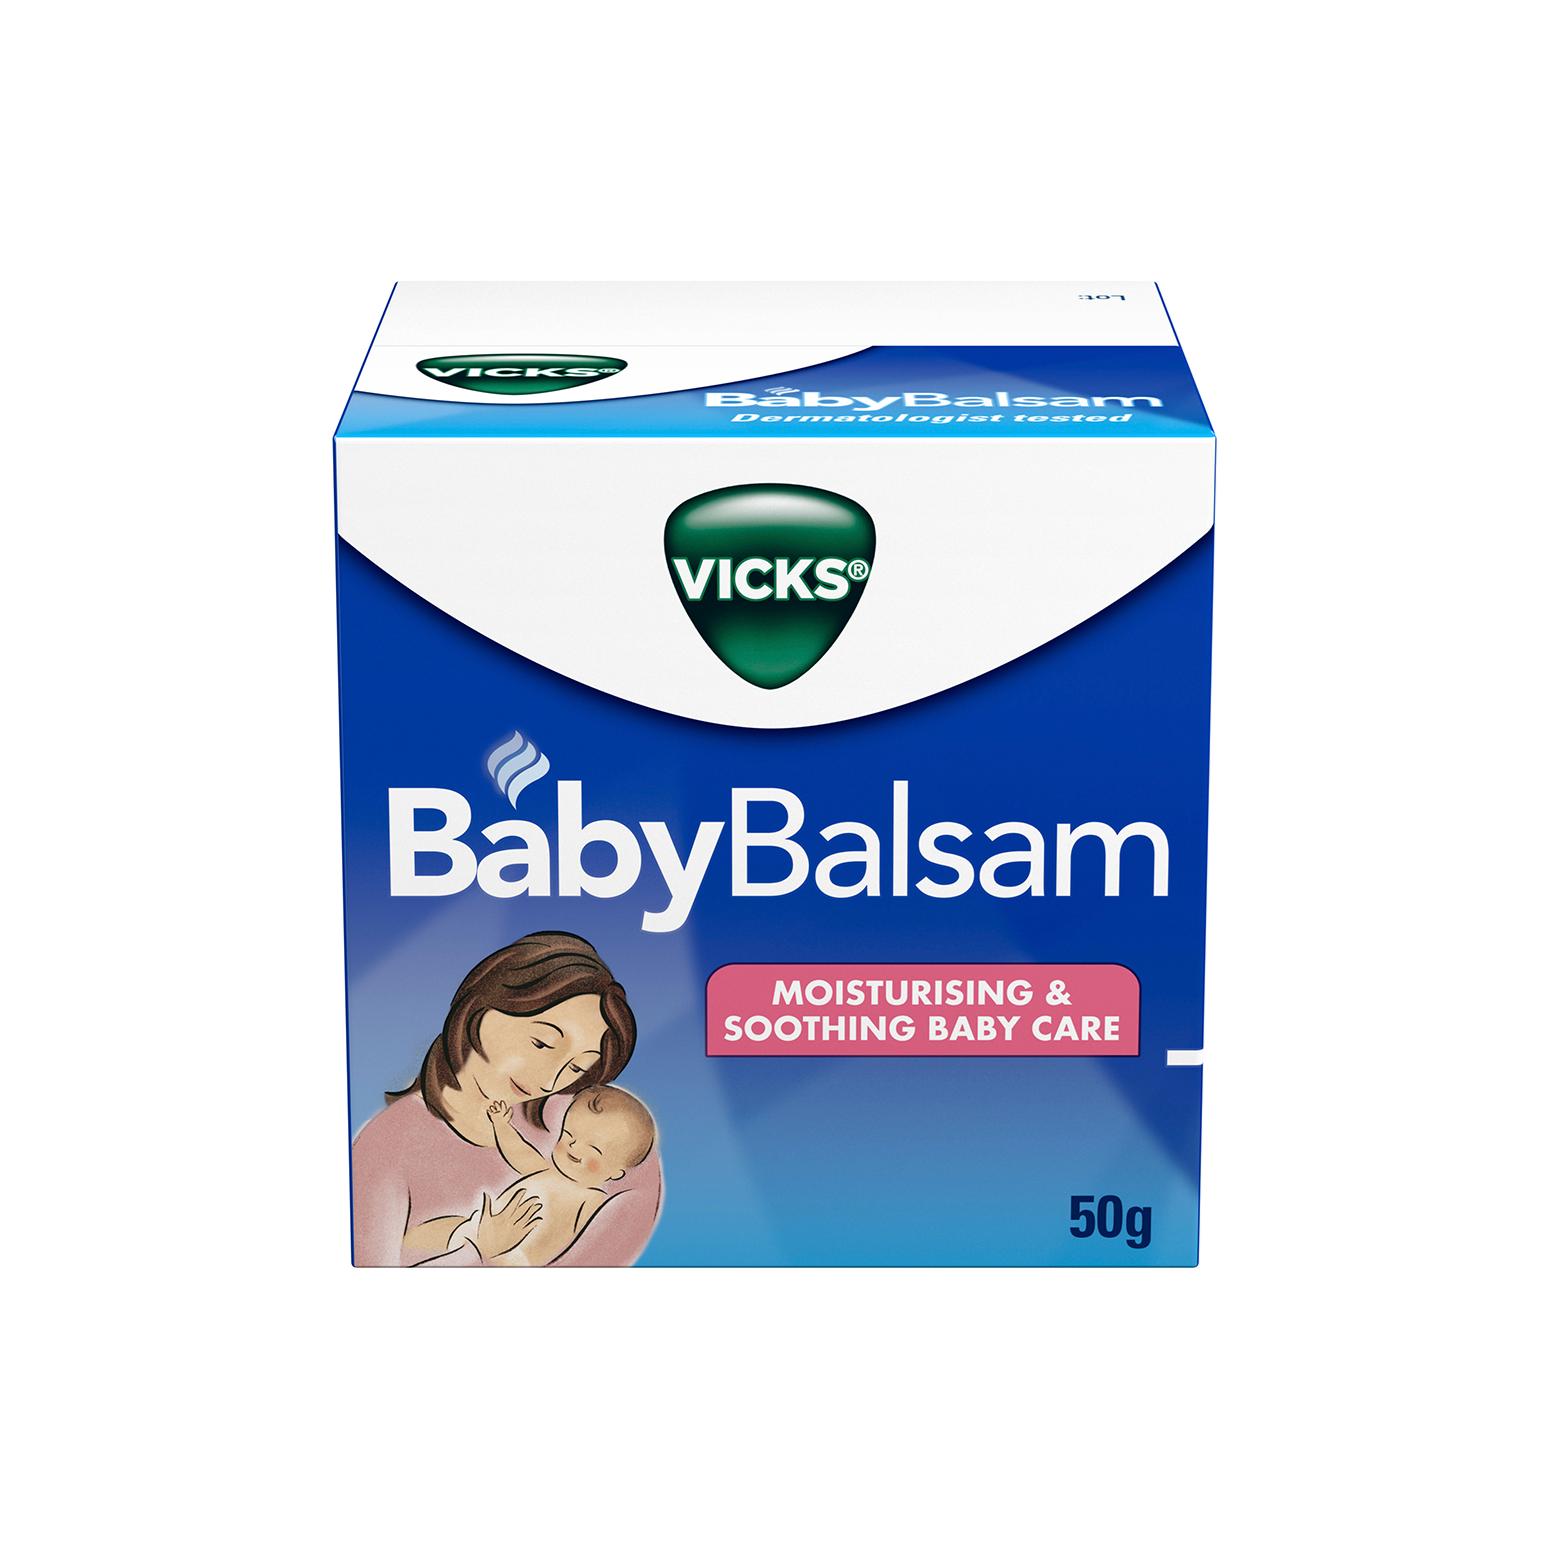 Vicks 寶寶通鼻舒緩膏 50g 緩解咳嗽